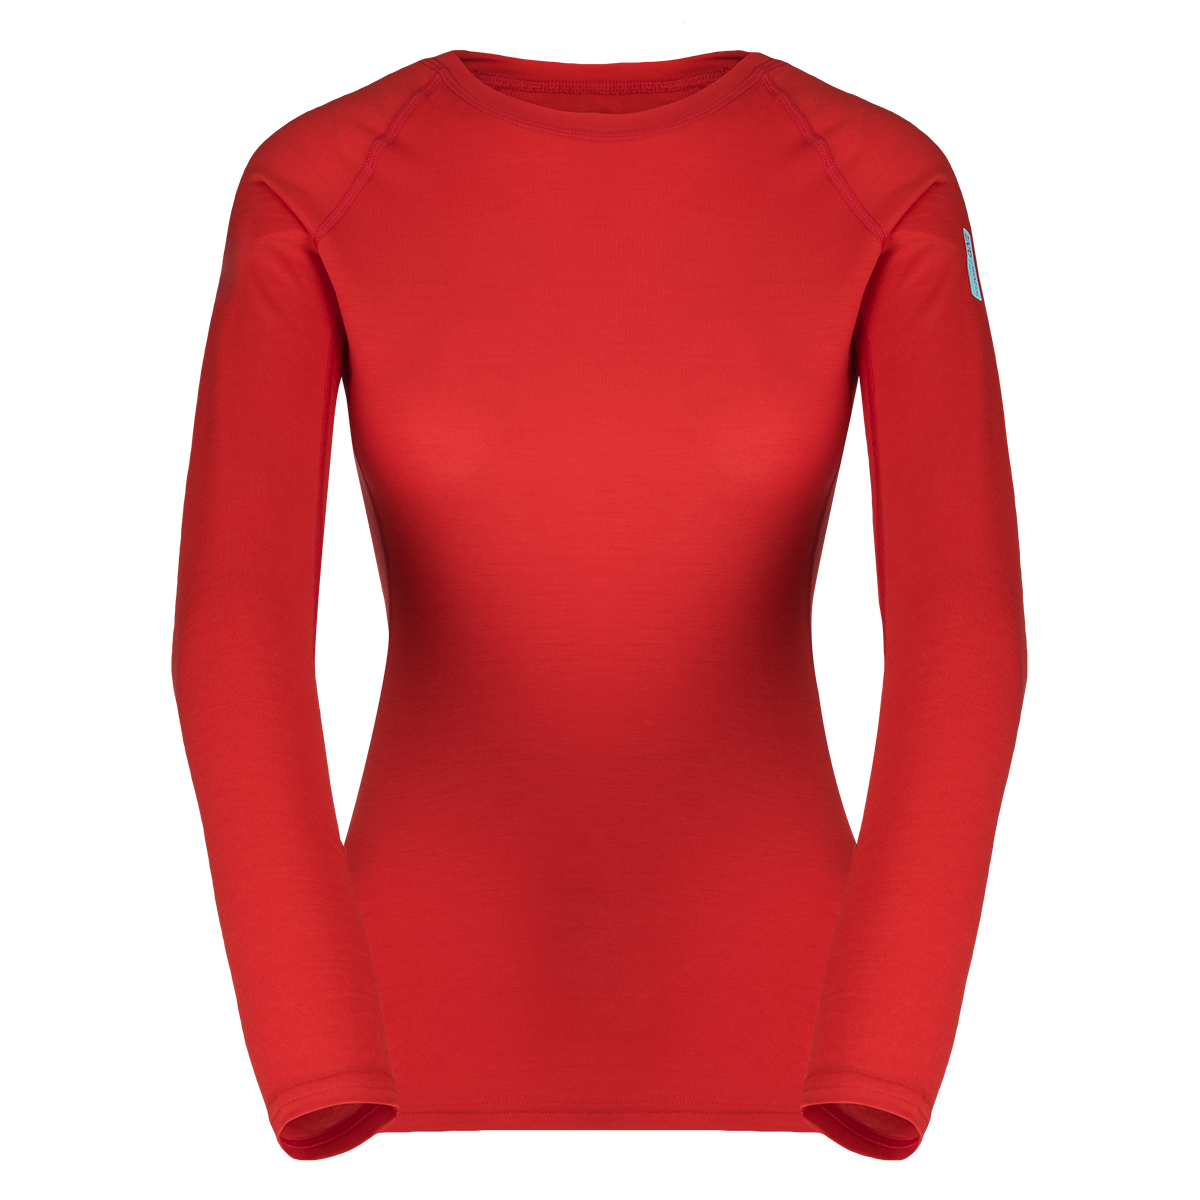 Zajo Elsa Merino W Tshirt LS Racing Red 1